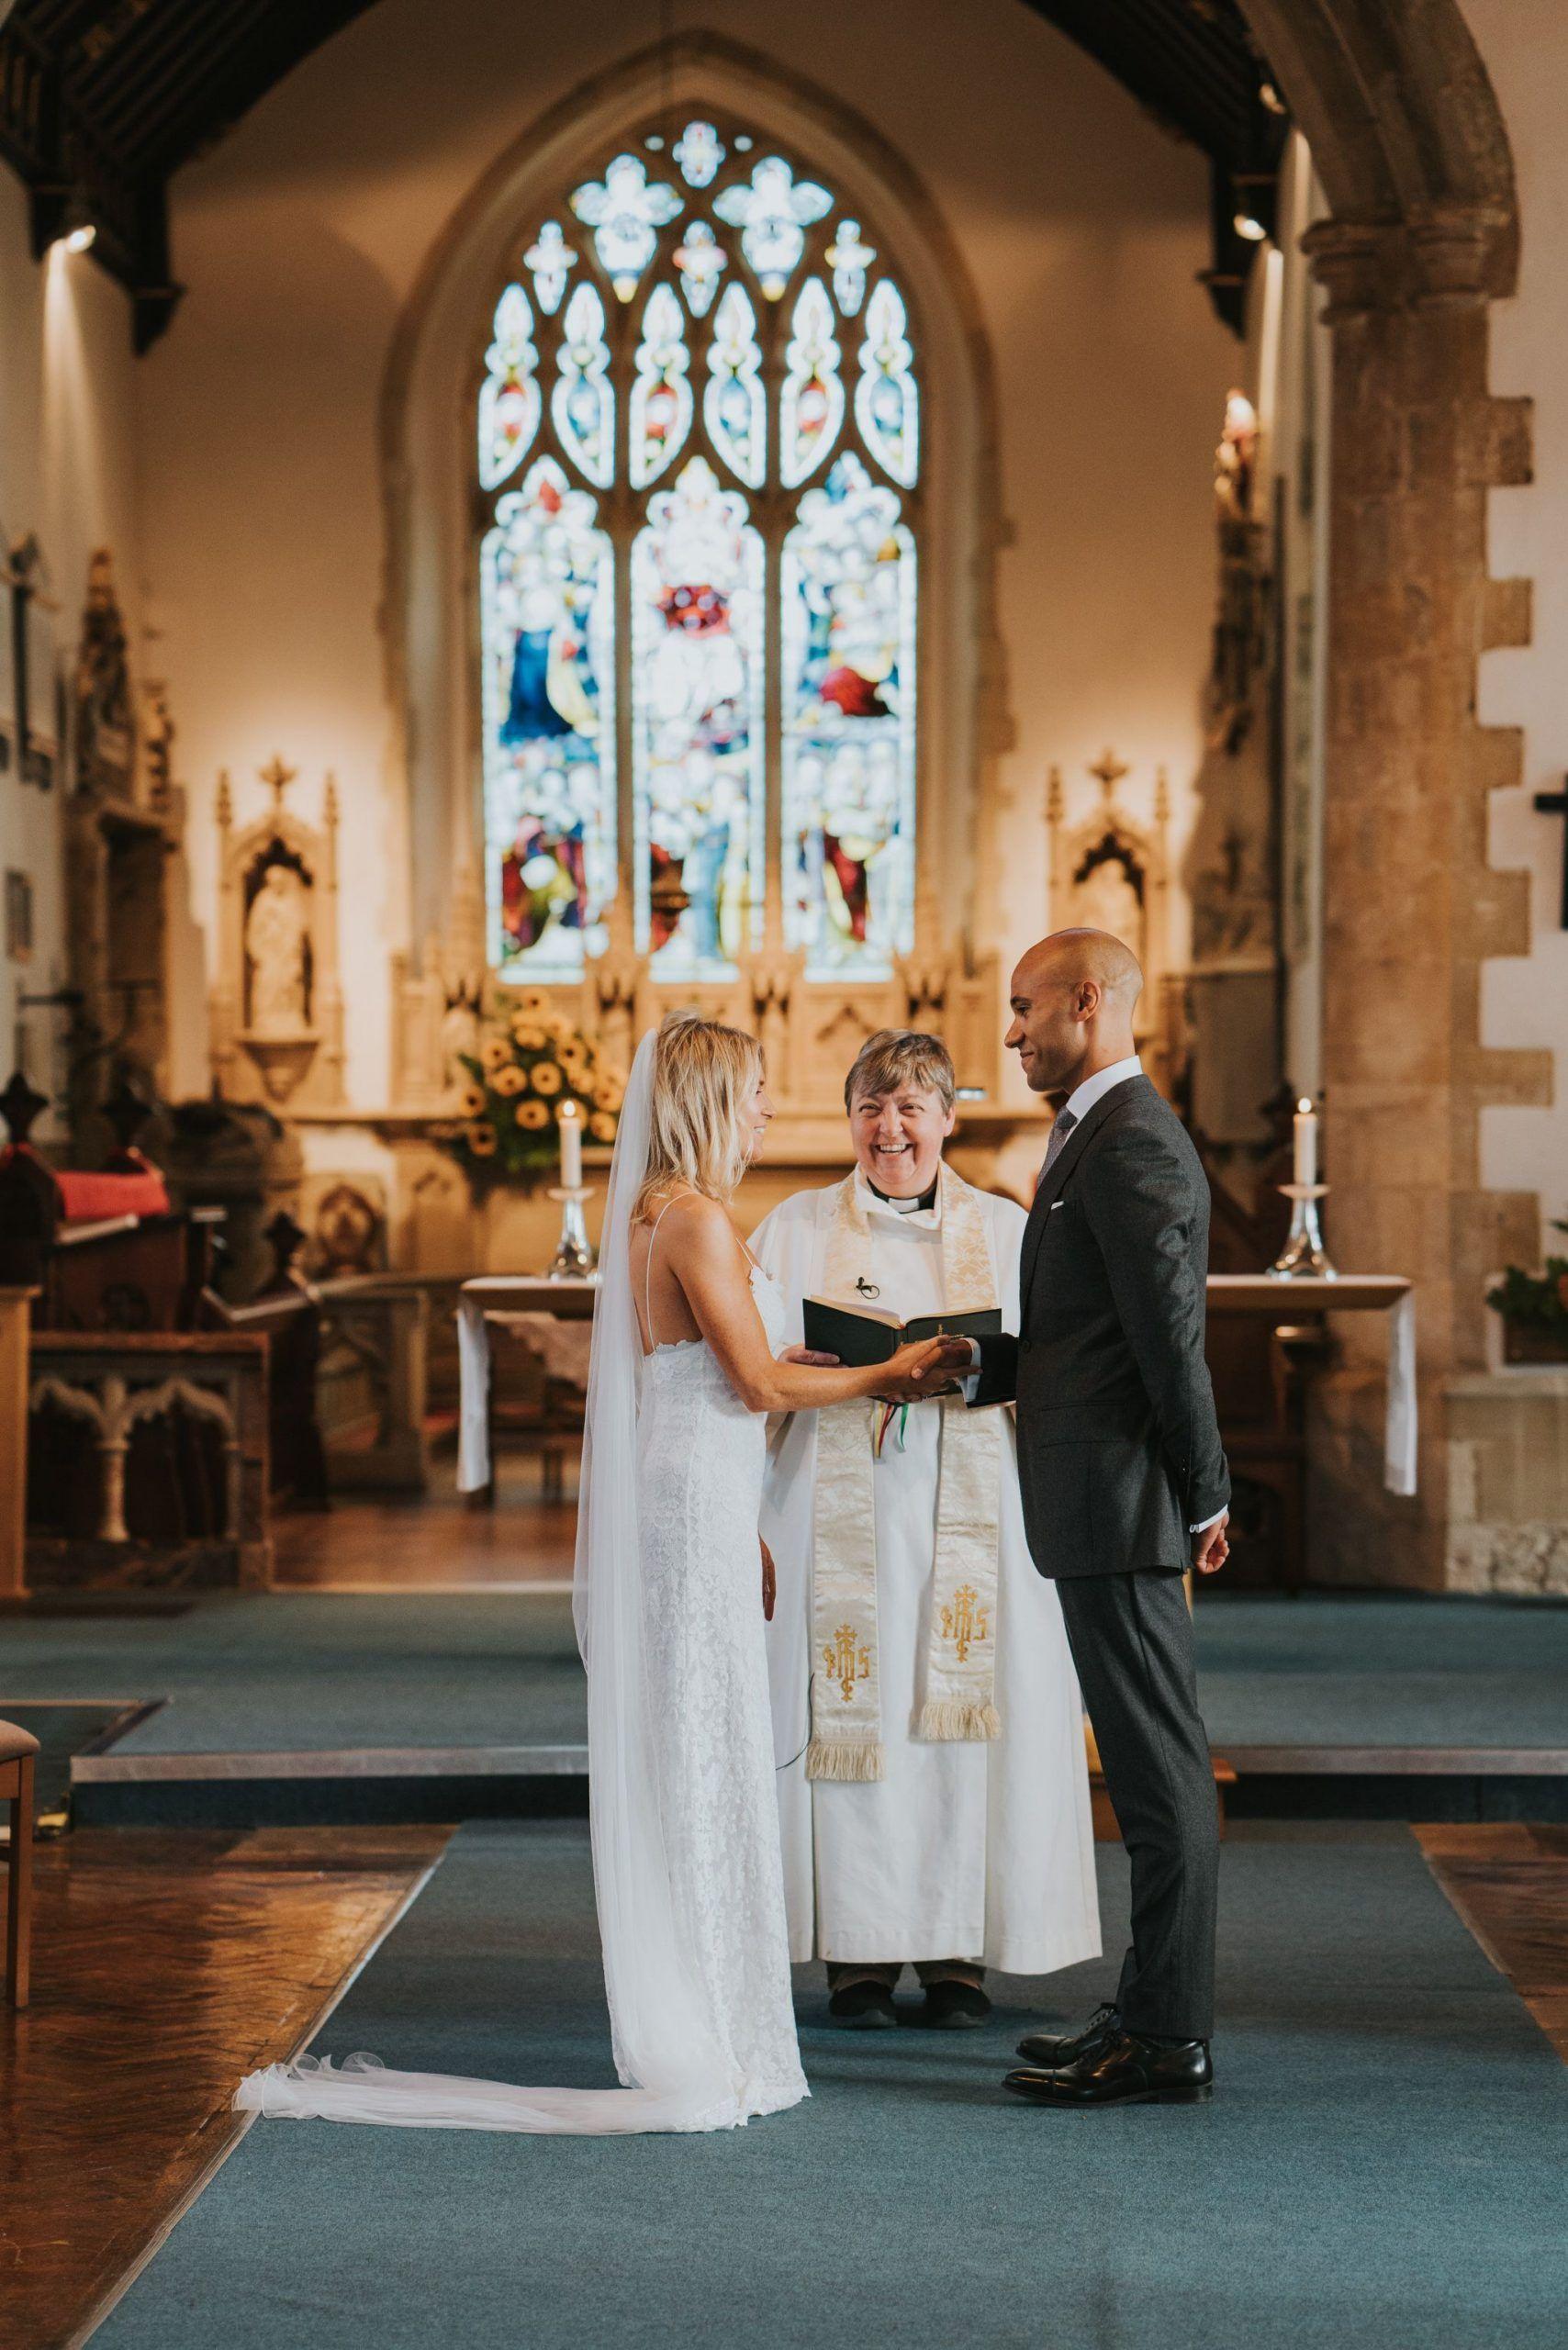 Christian wedding in natural light church. Catholic